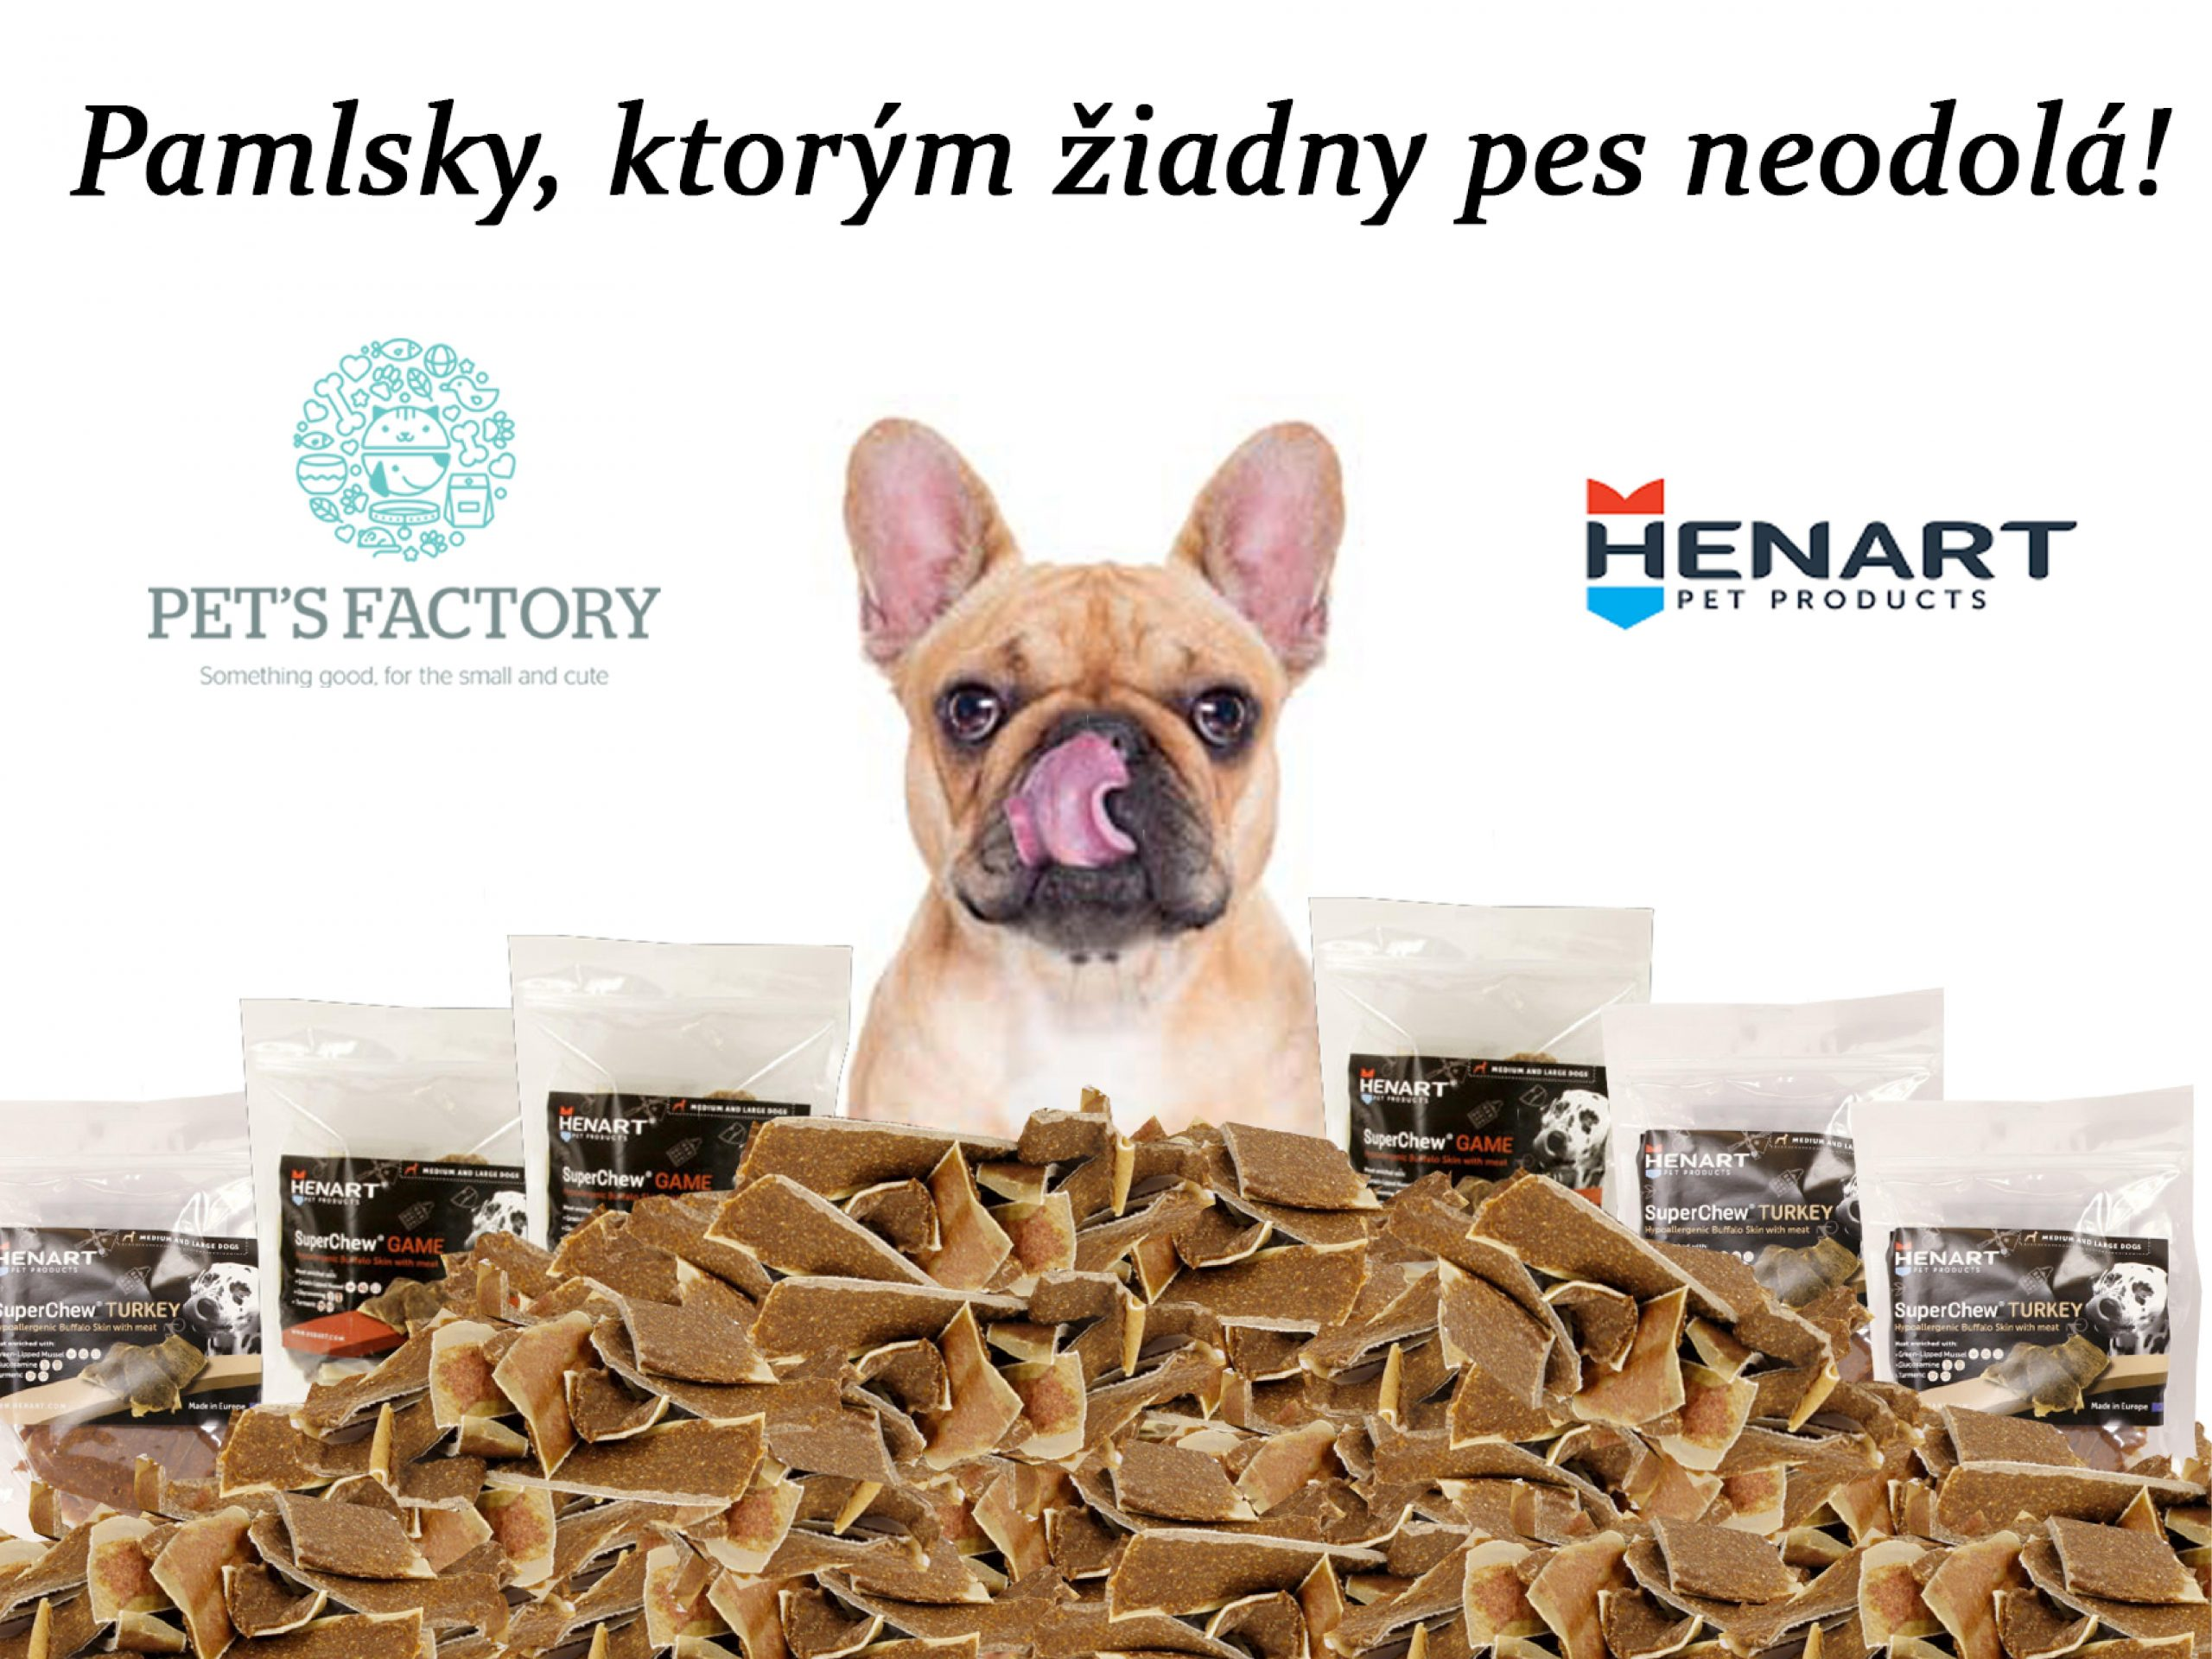 Pet's Factory